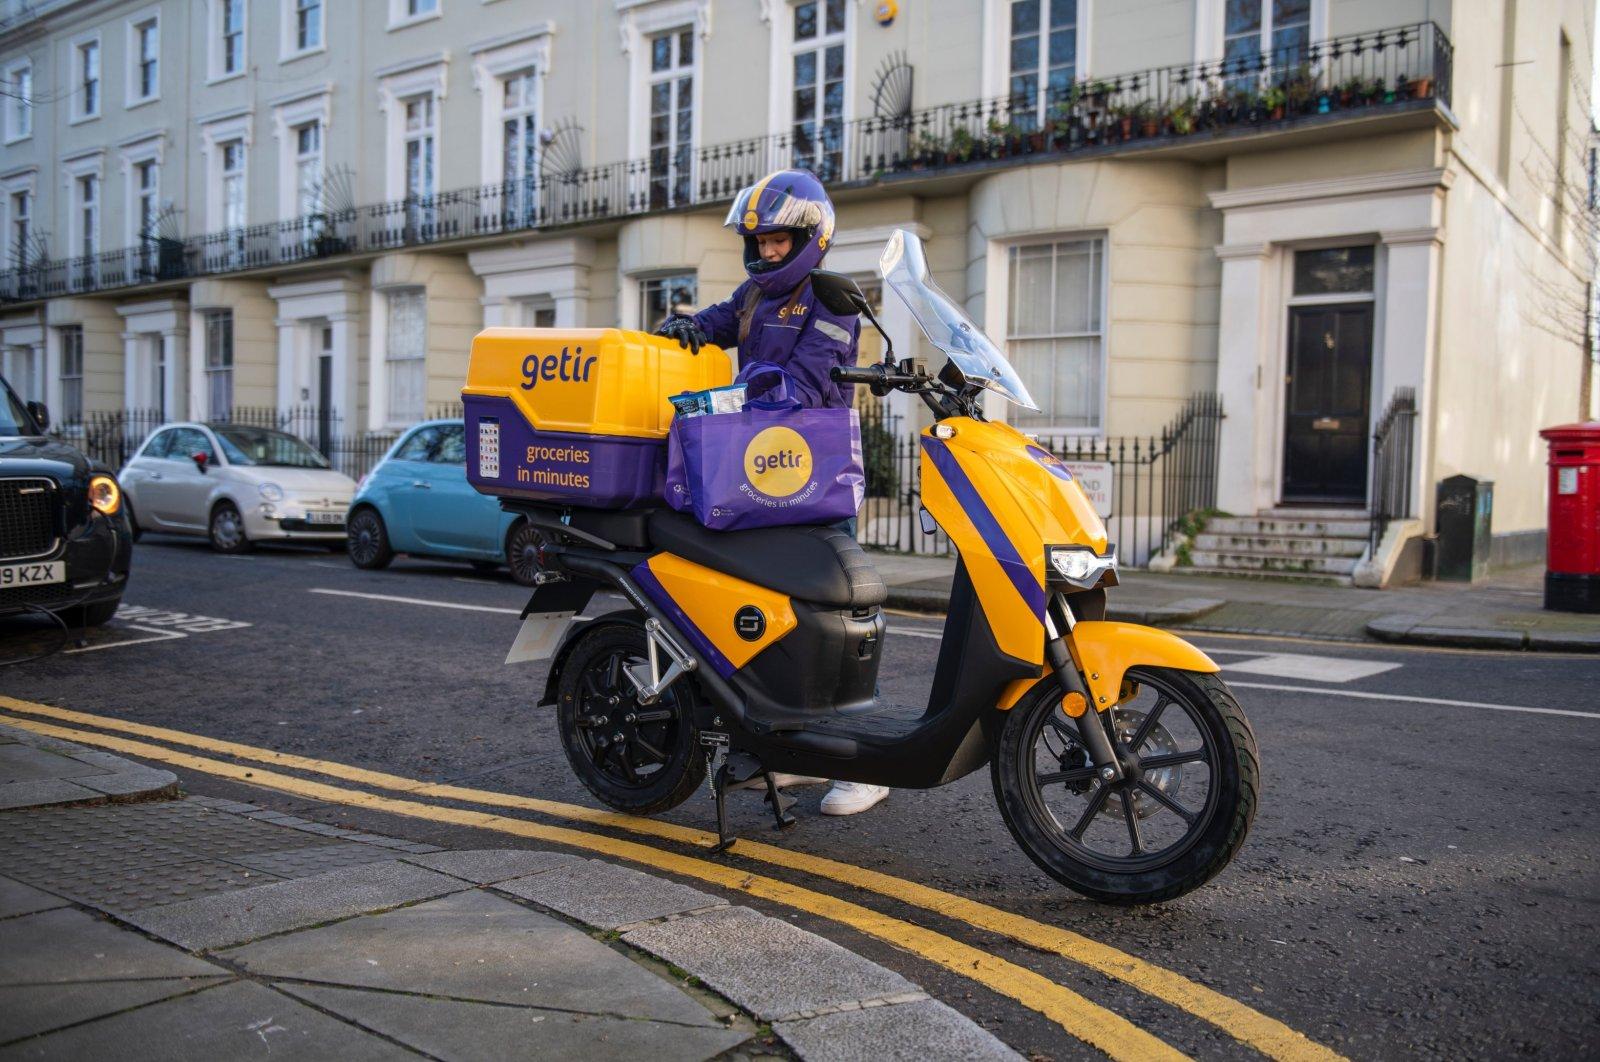 A Getir courier is seen beside his bike, London, U.K., Jan. 27, 2021. (Courtesy of Getir)